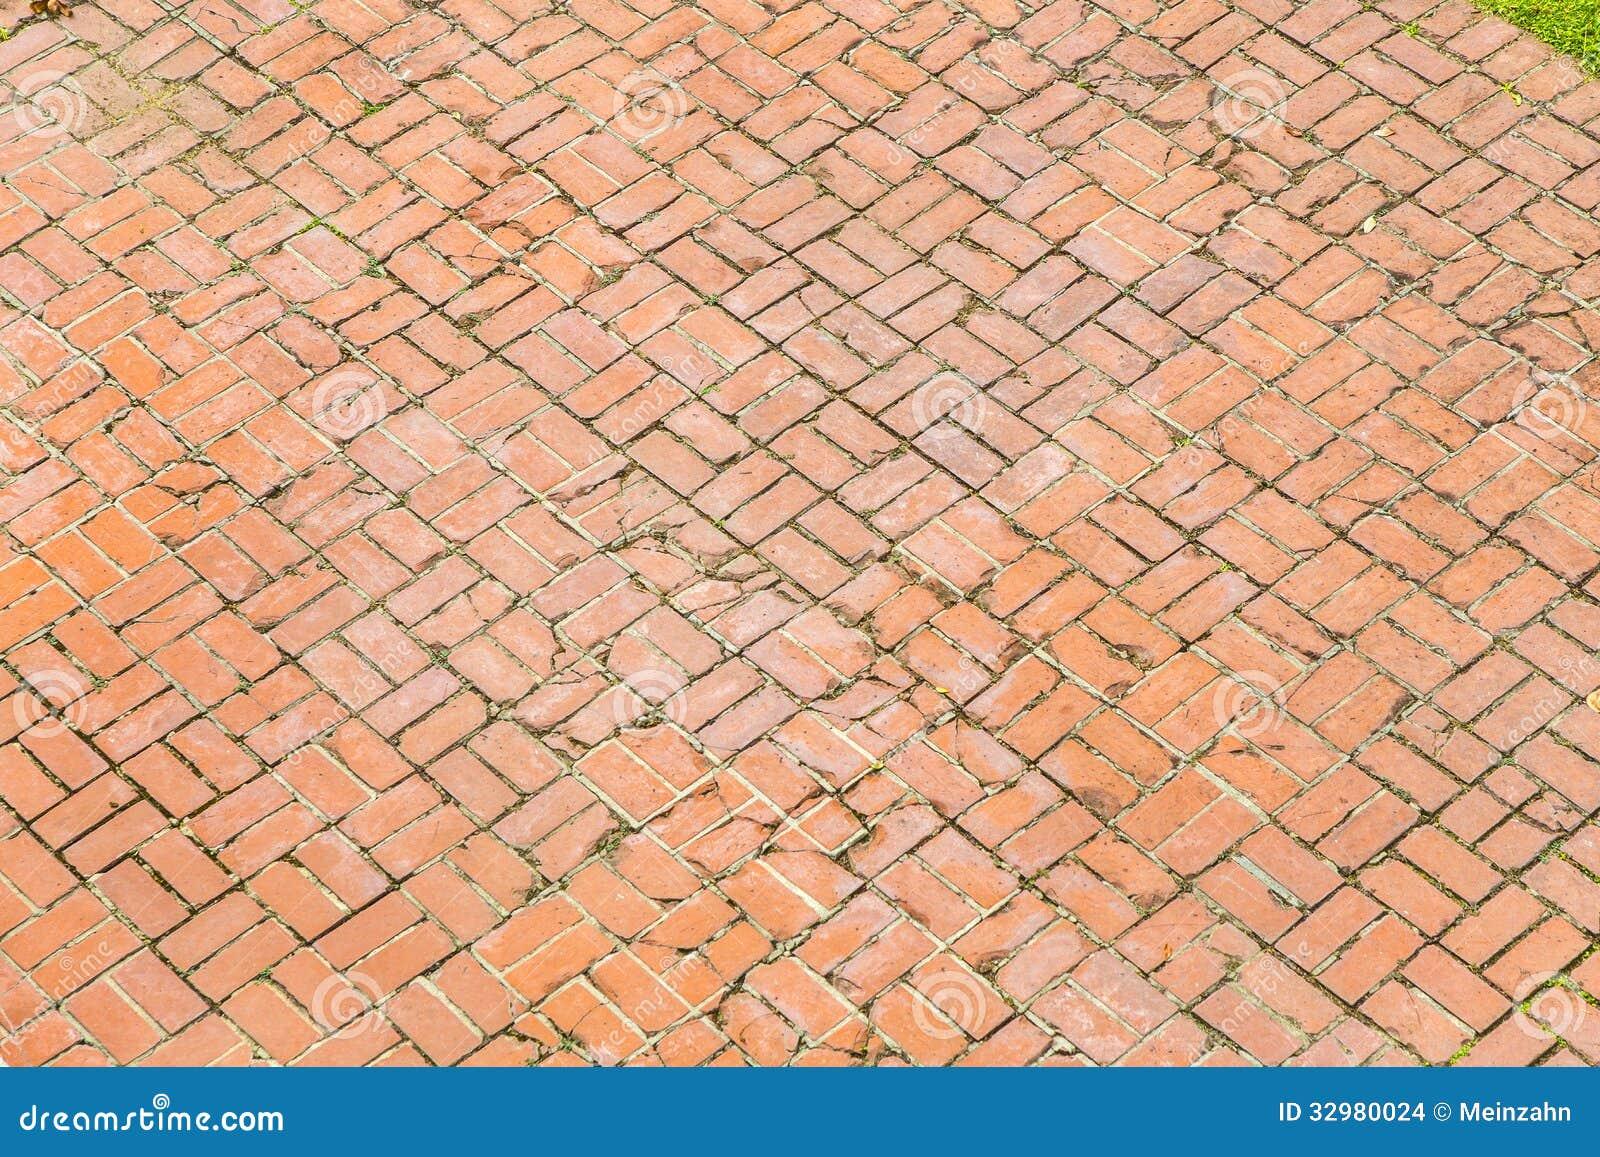 Z Brick Flooring : Old brick floor of an american stock images image